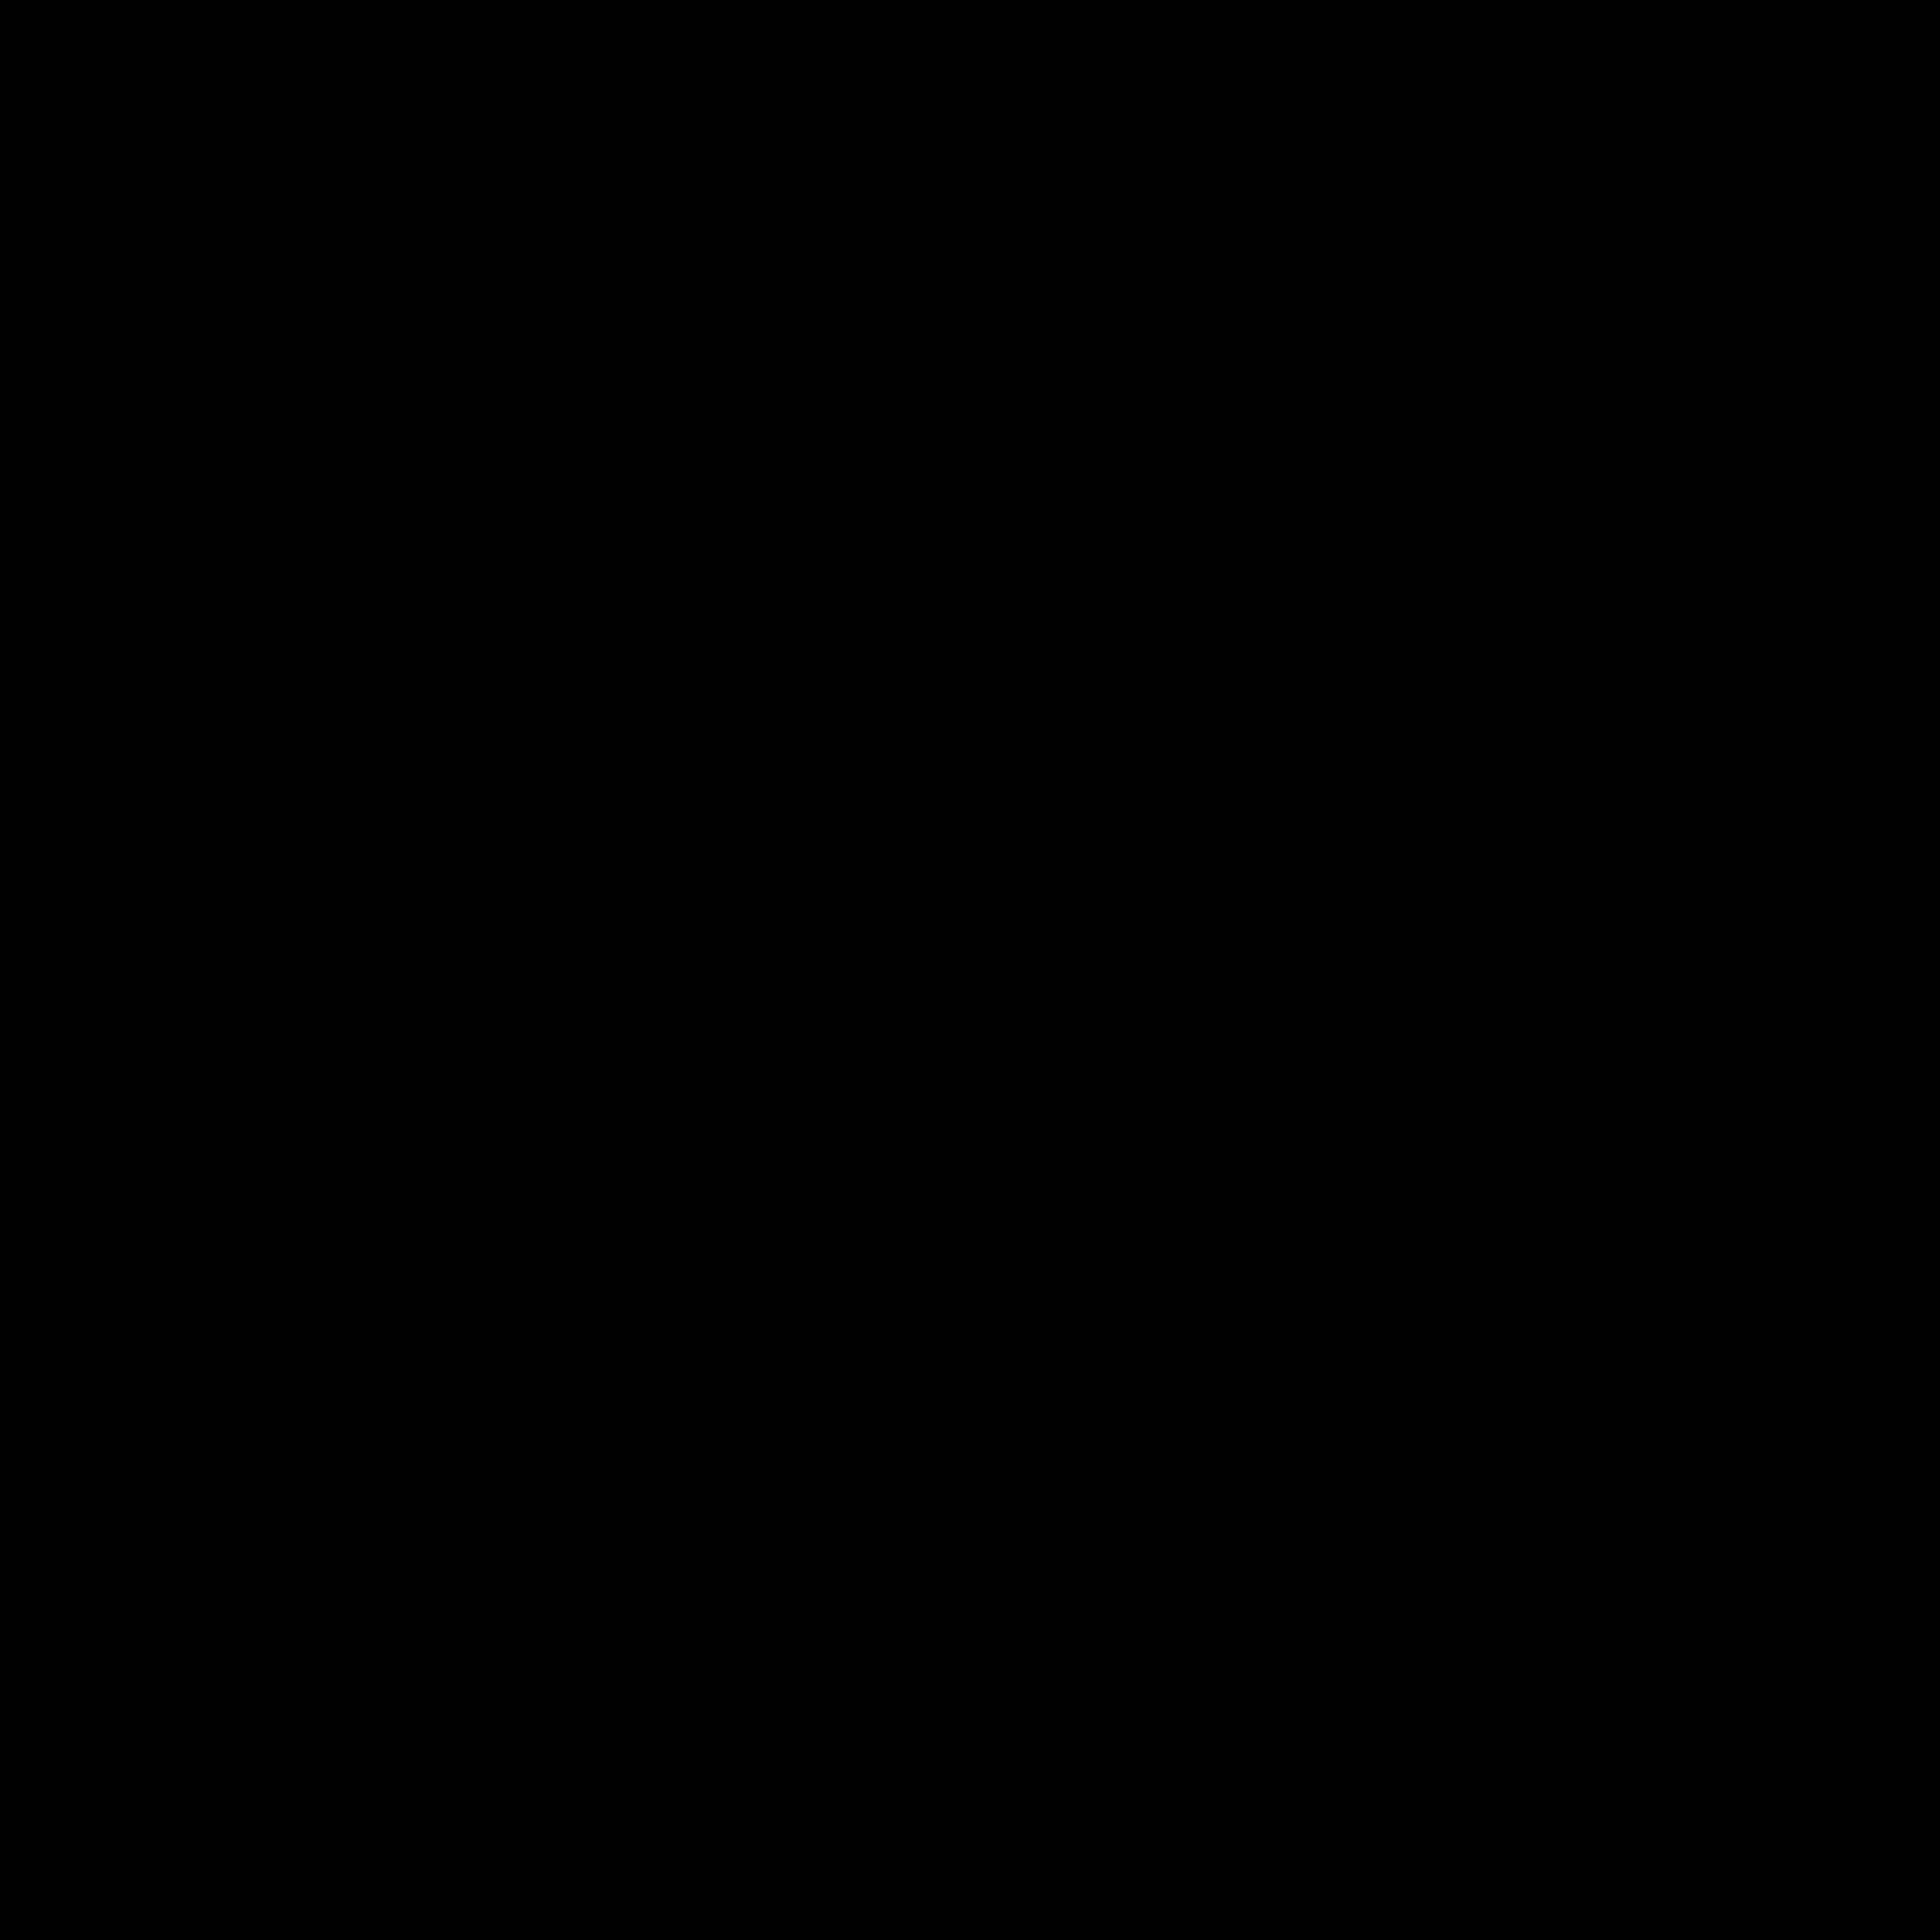 library File maki wikimedia commons. Baseball clip svg